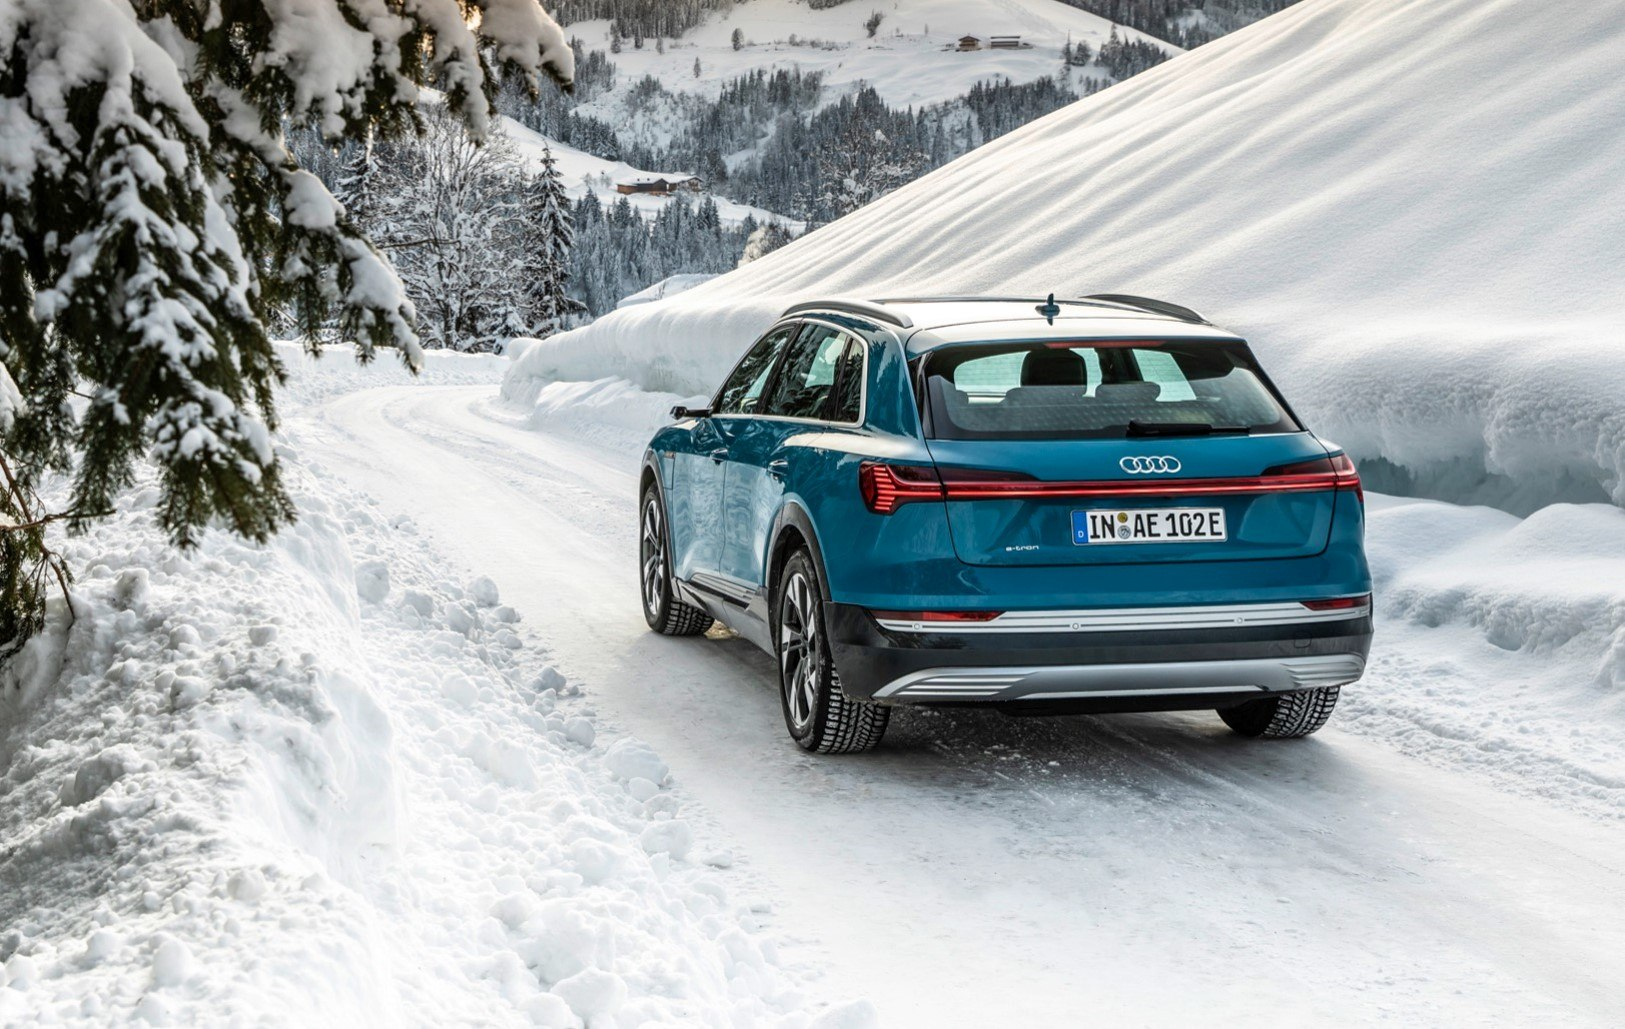 Audi Genuine Winter Sports Accessories